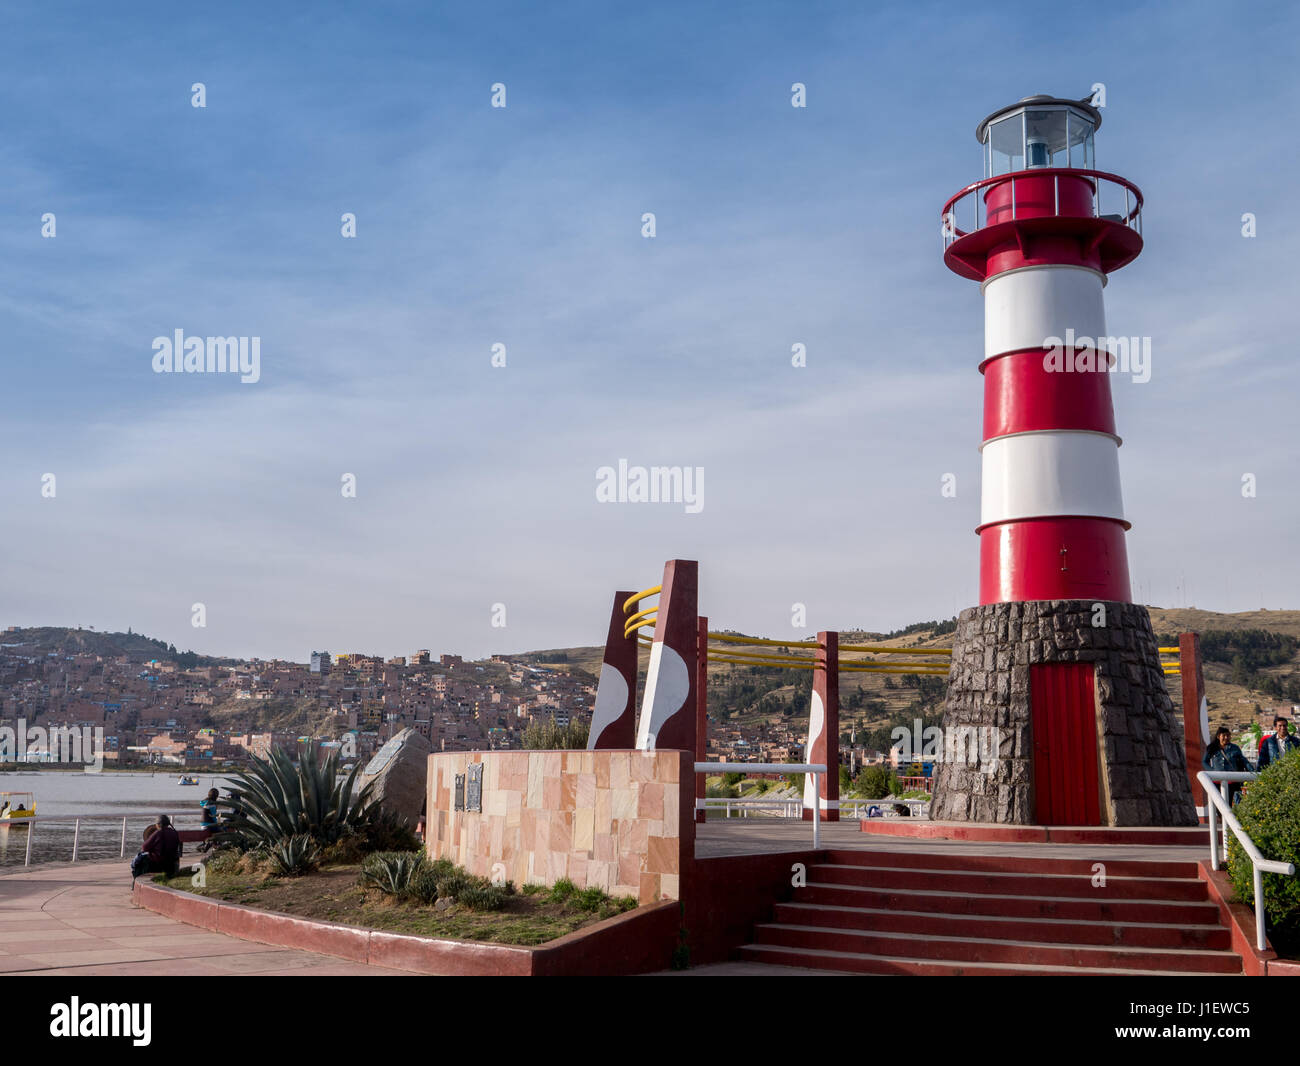 Puno City on the shore of Lake Titikaka Peru South America, lighthouse - Stock Image